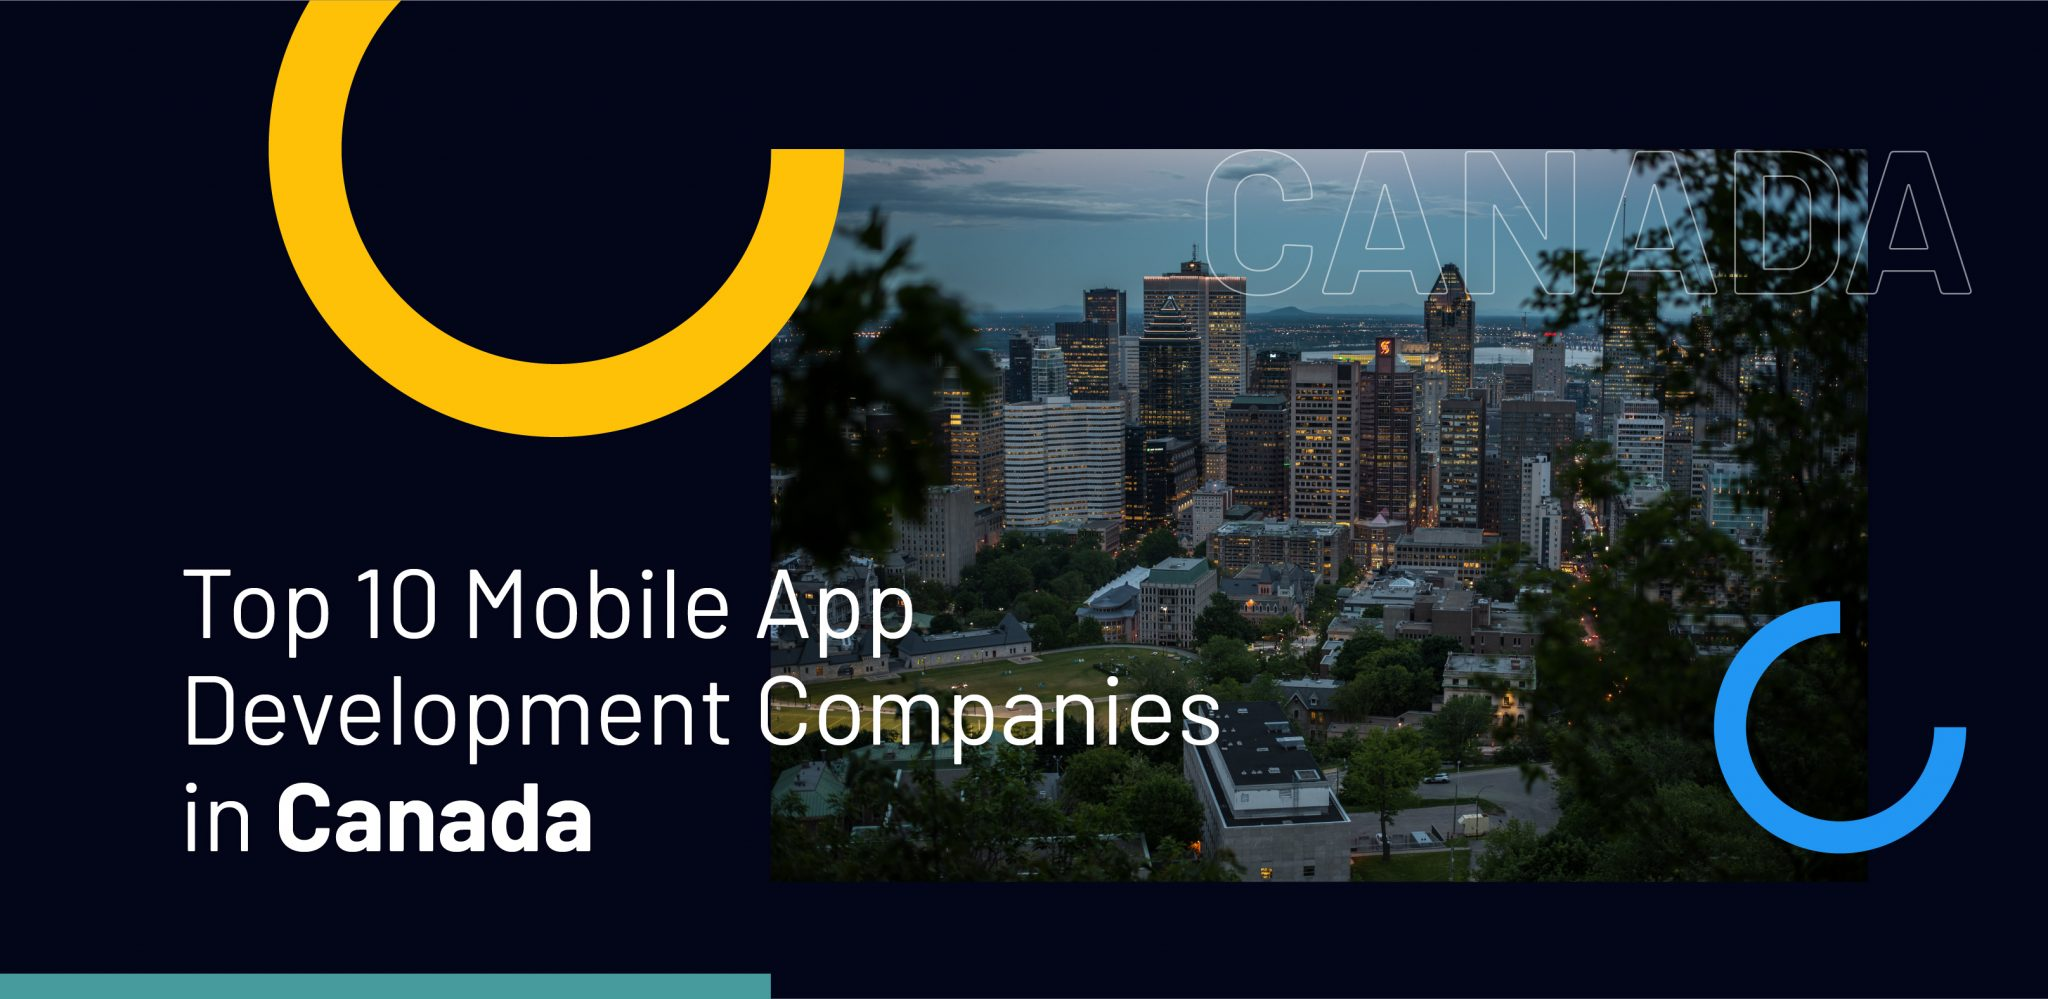 Top 10 Mobile App Development Companies in Canada - WebClues Infotech